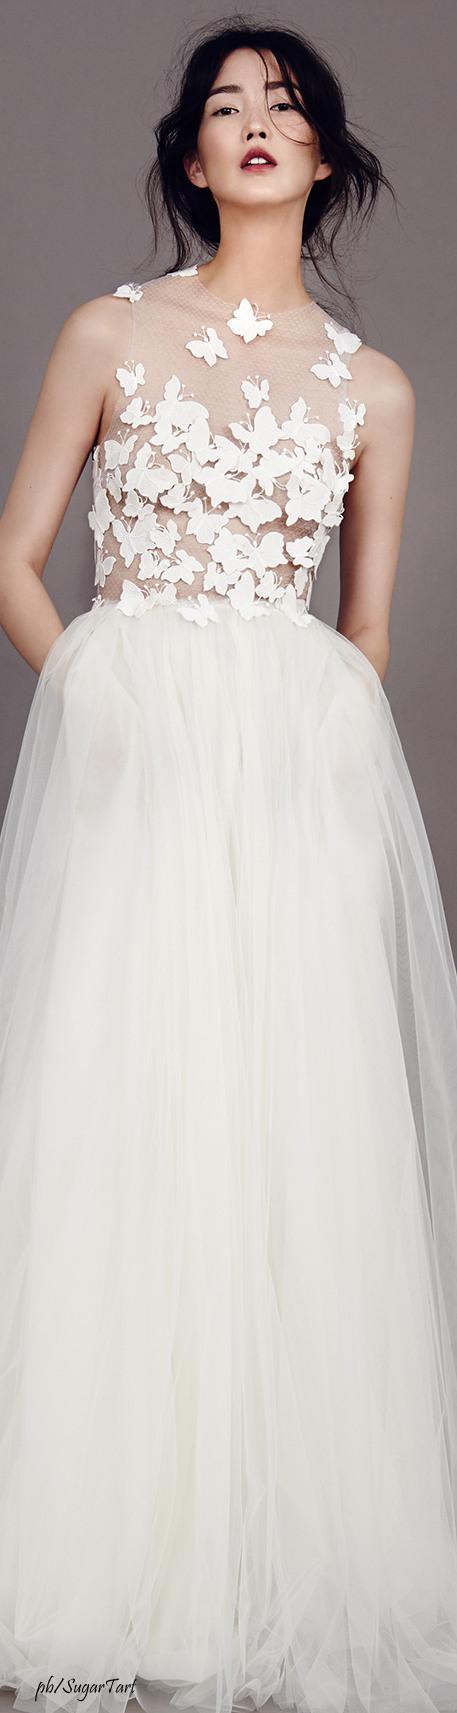 kaviar gauche bridal 2015 style fashion pinterest. Black Bedroom Furniture Sets. Home Design Ideas